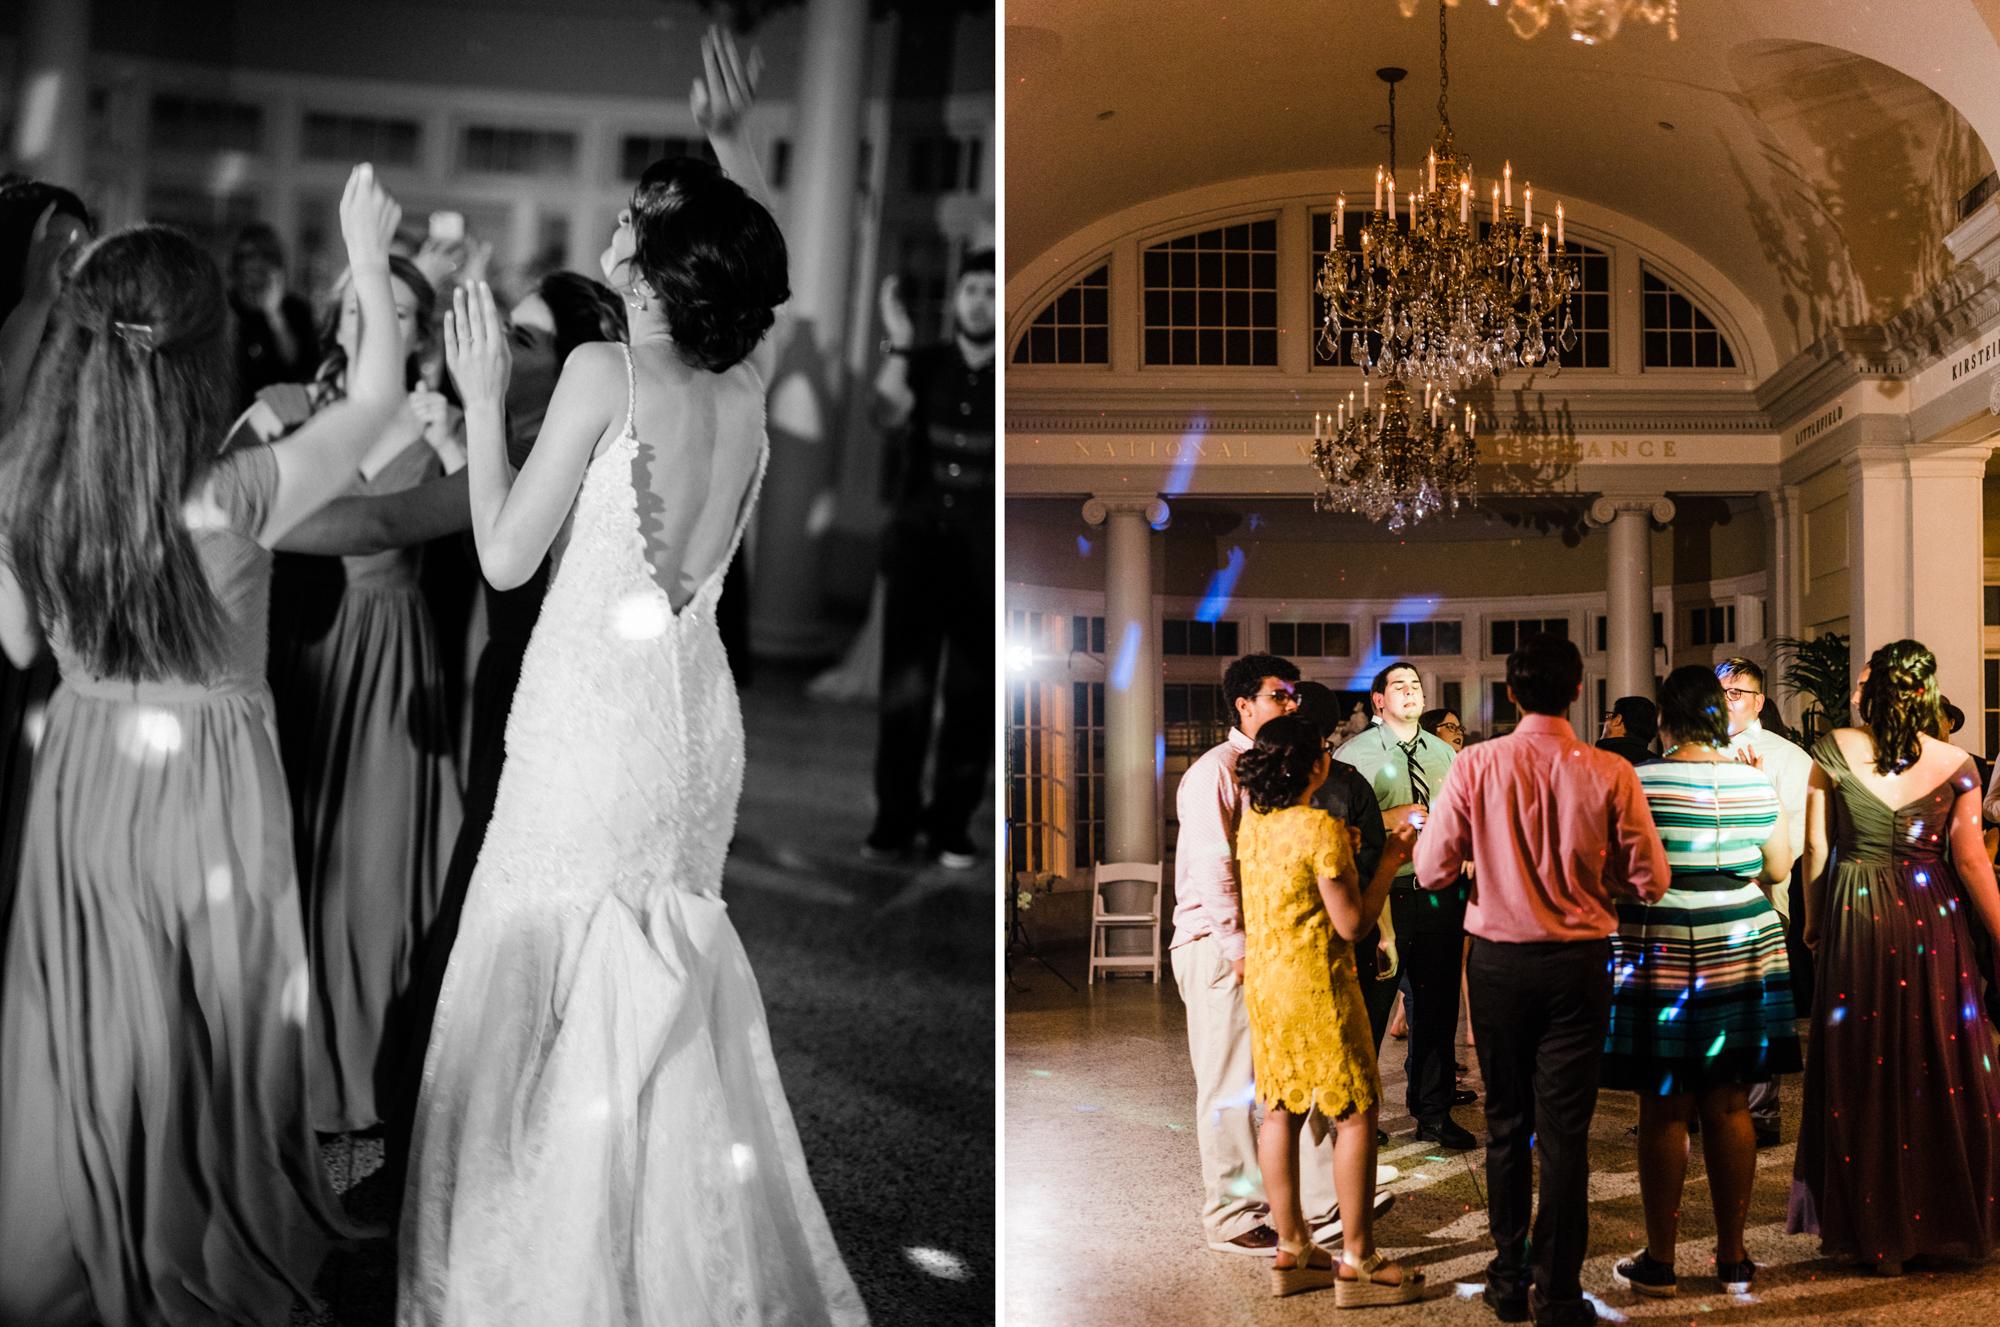 saratoga-springs-new-york-national-museum-of-dance-film-wedding-photographer-69.jpg